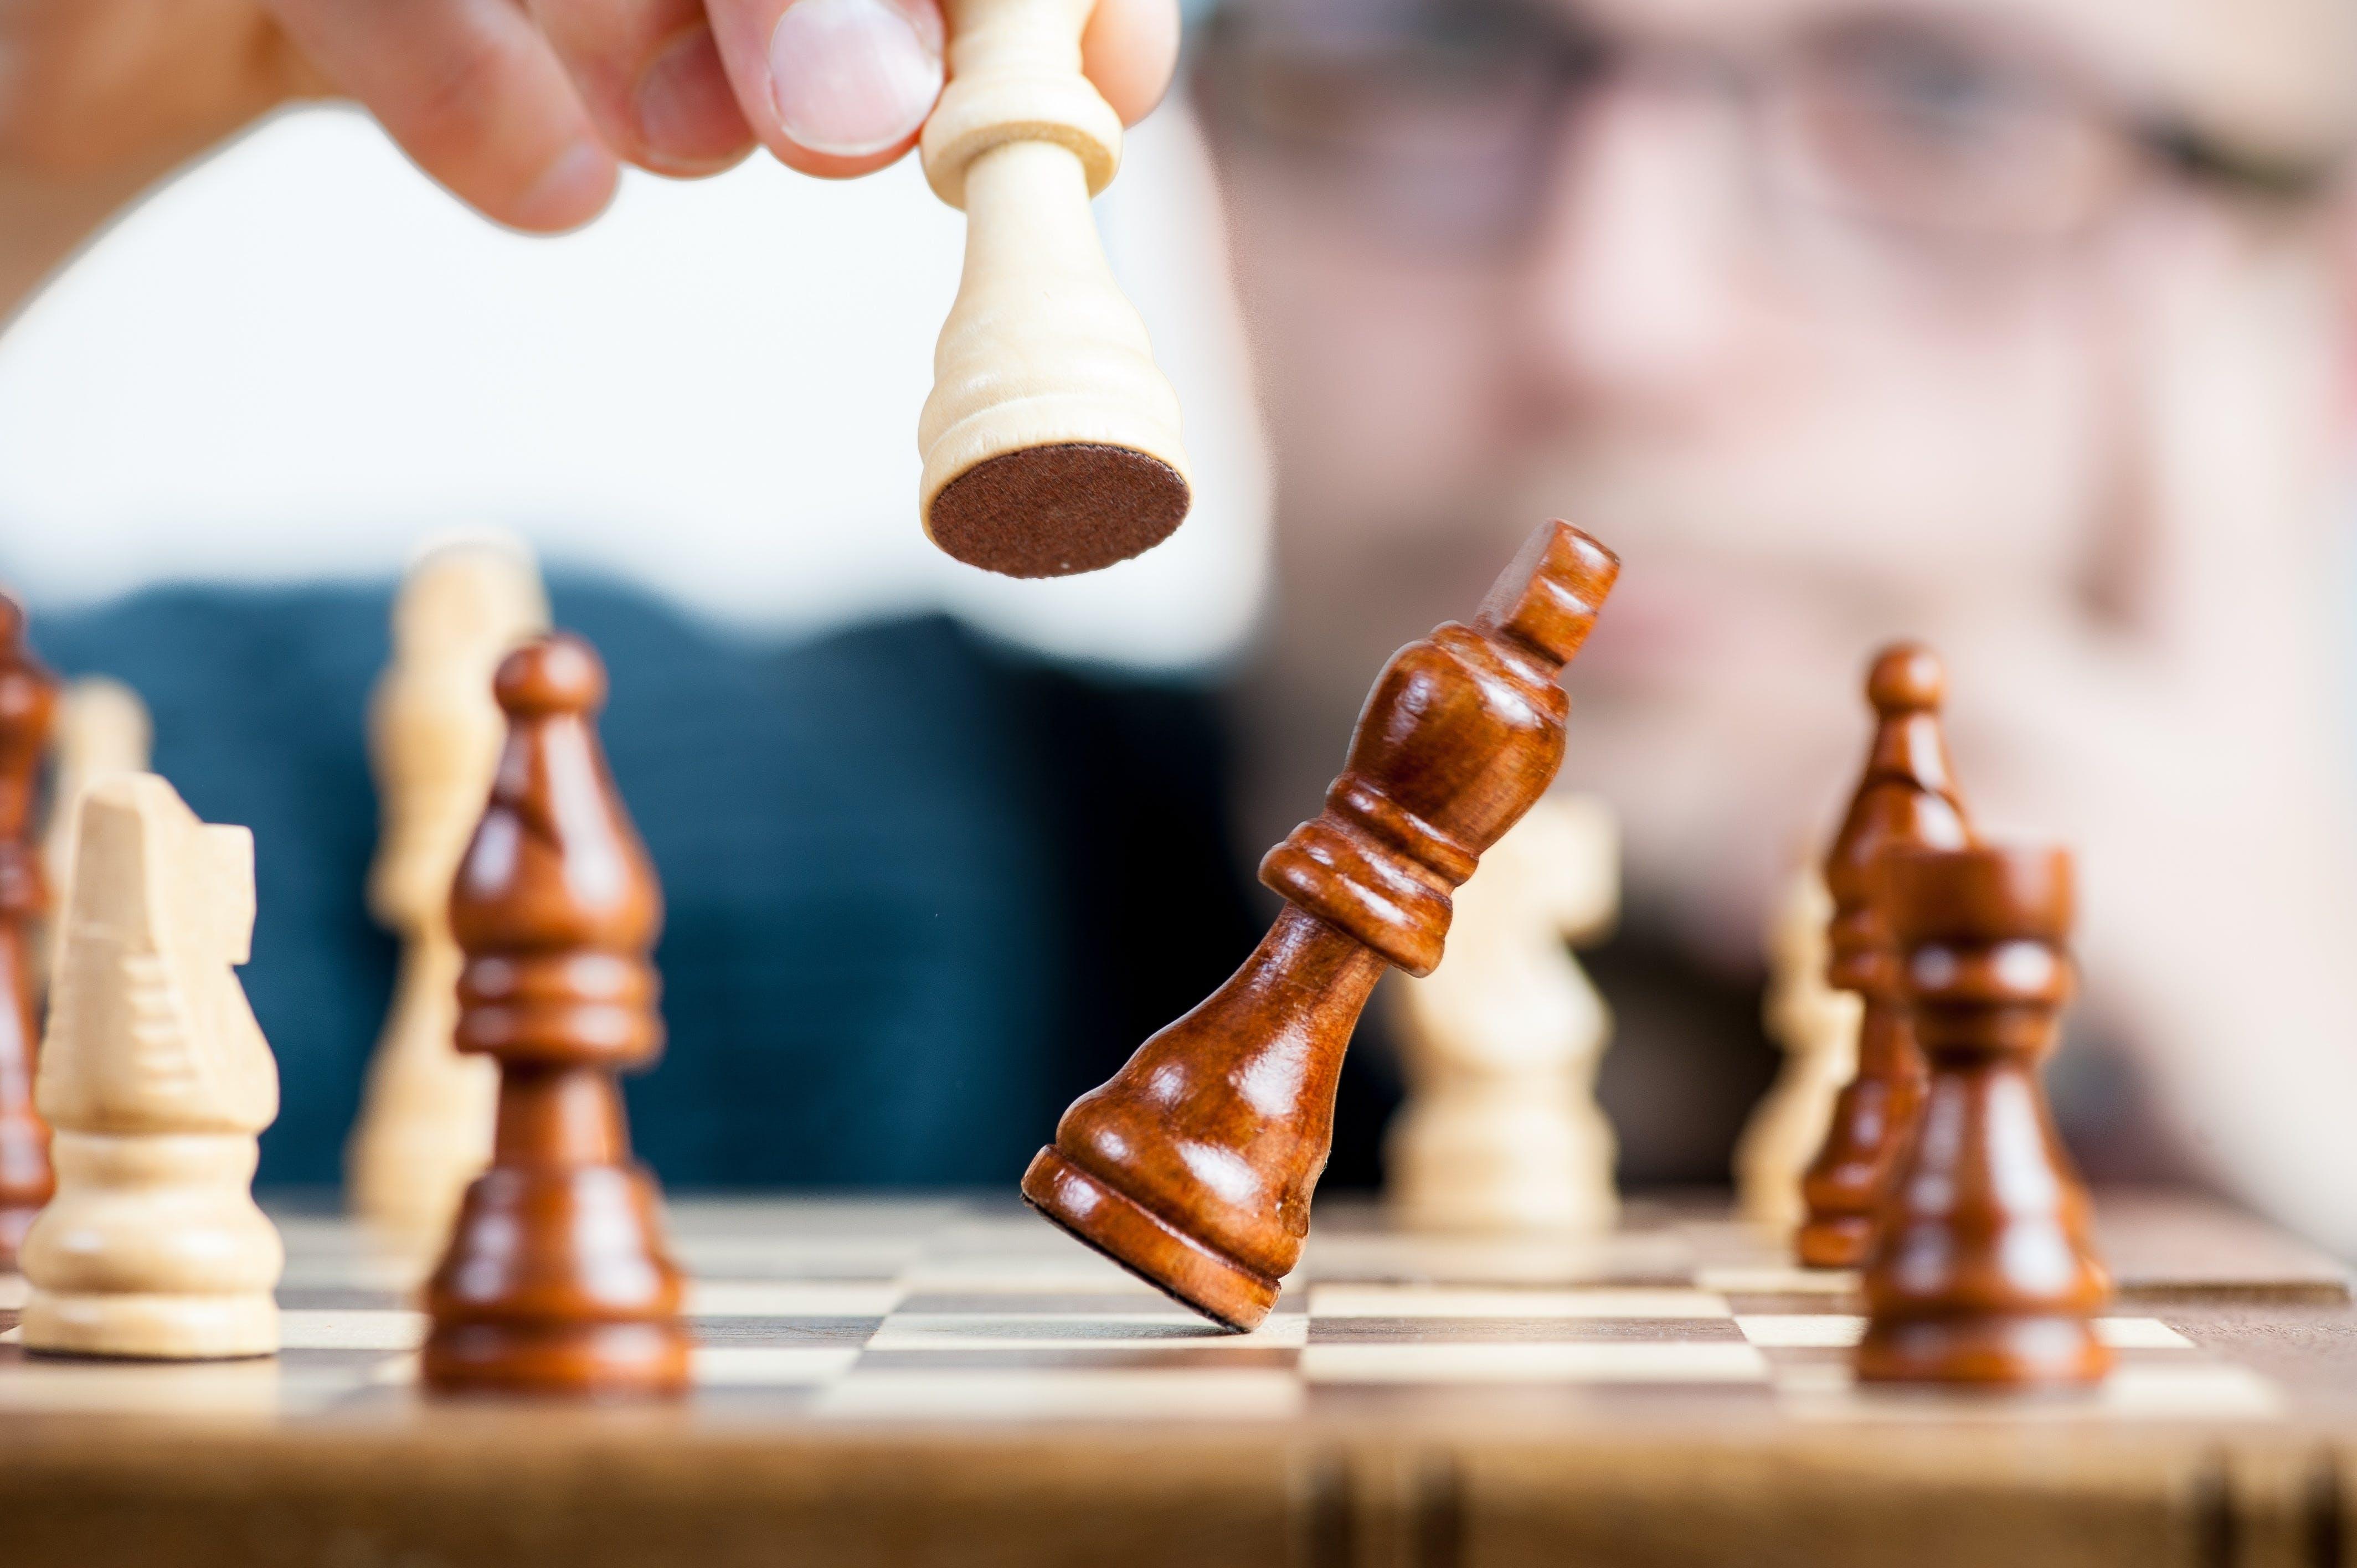 decision-making-image